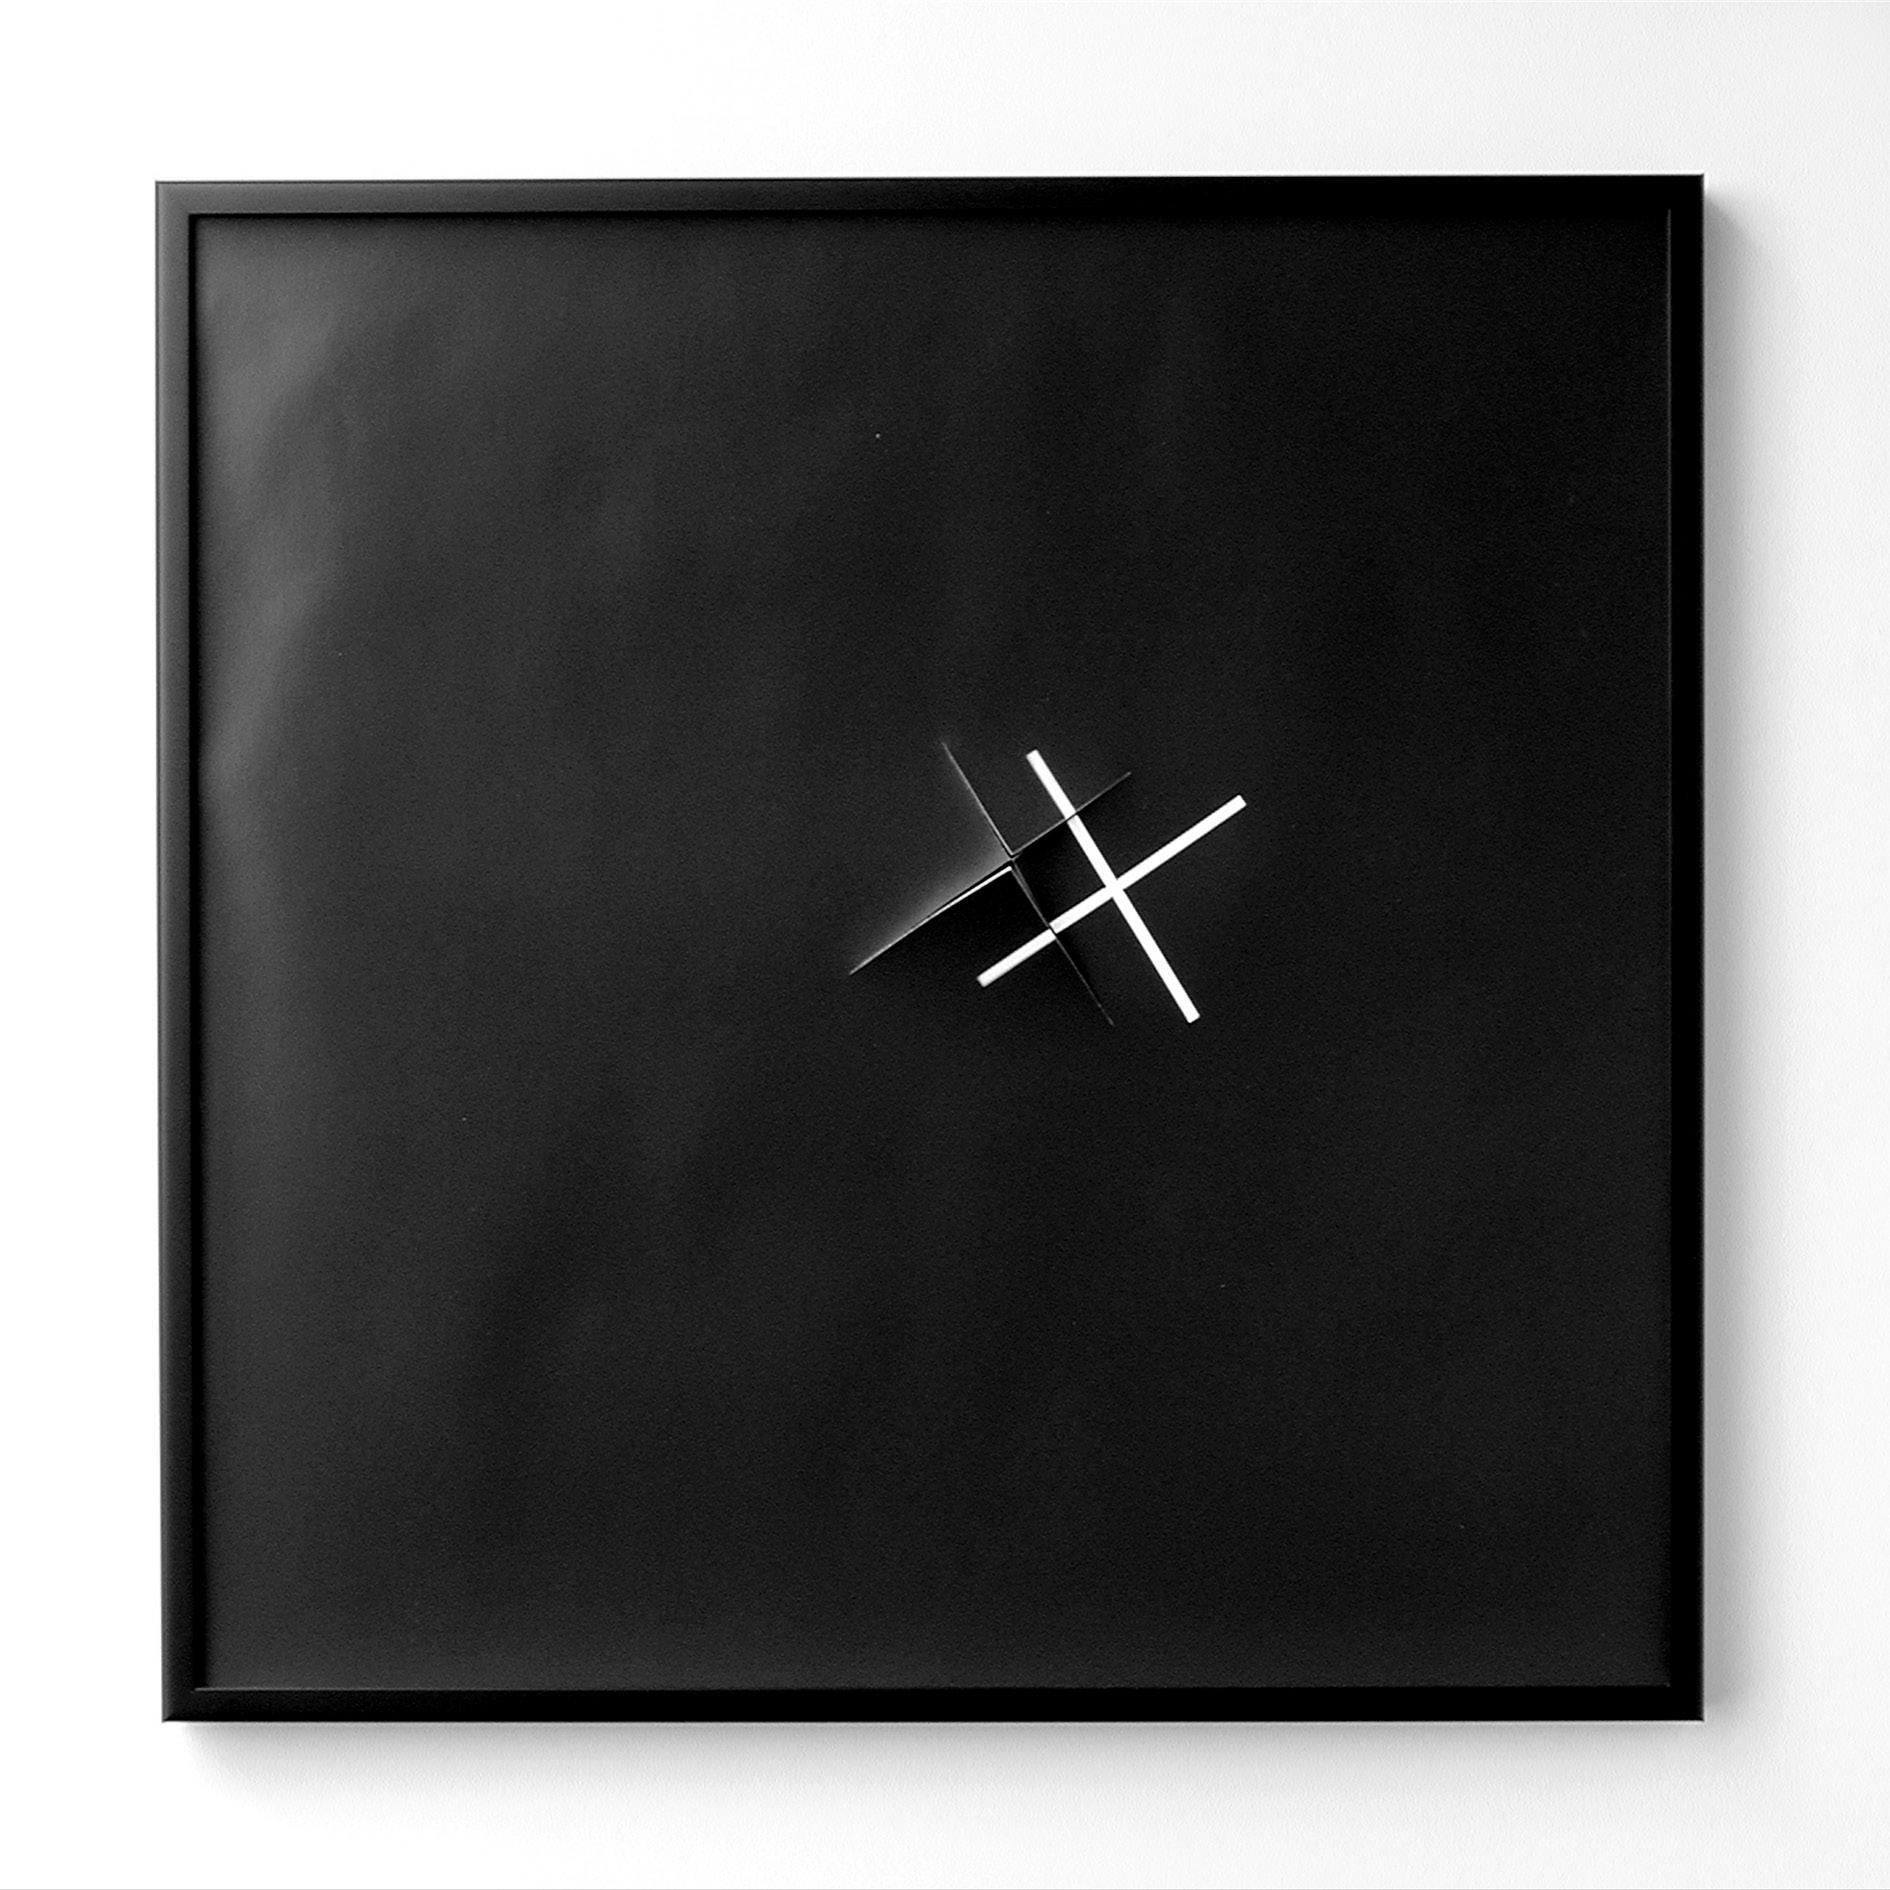 Doppelkreuz-Fotopapierarbeit IX, 1996